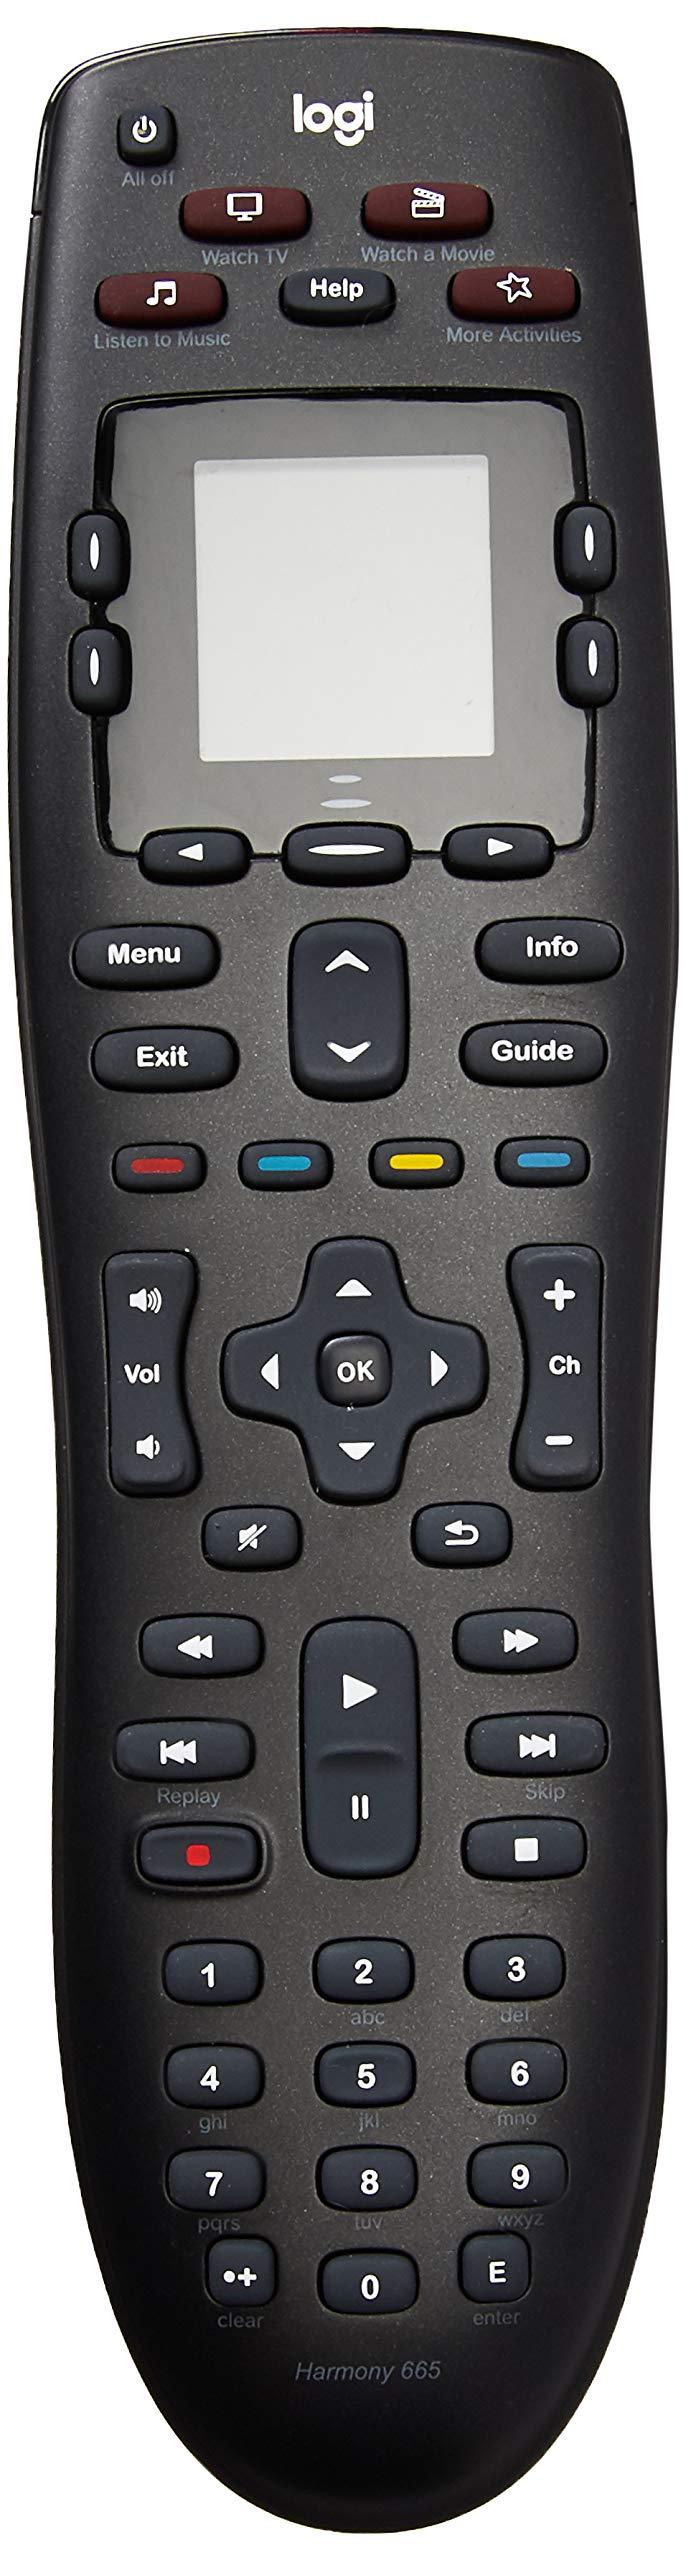 Logitech - Harmony 665 10-Device Universal Remote - Black (Renewed) by Logitech